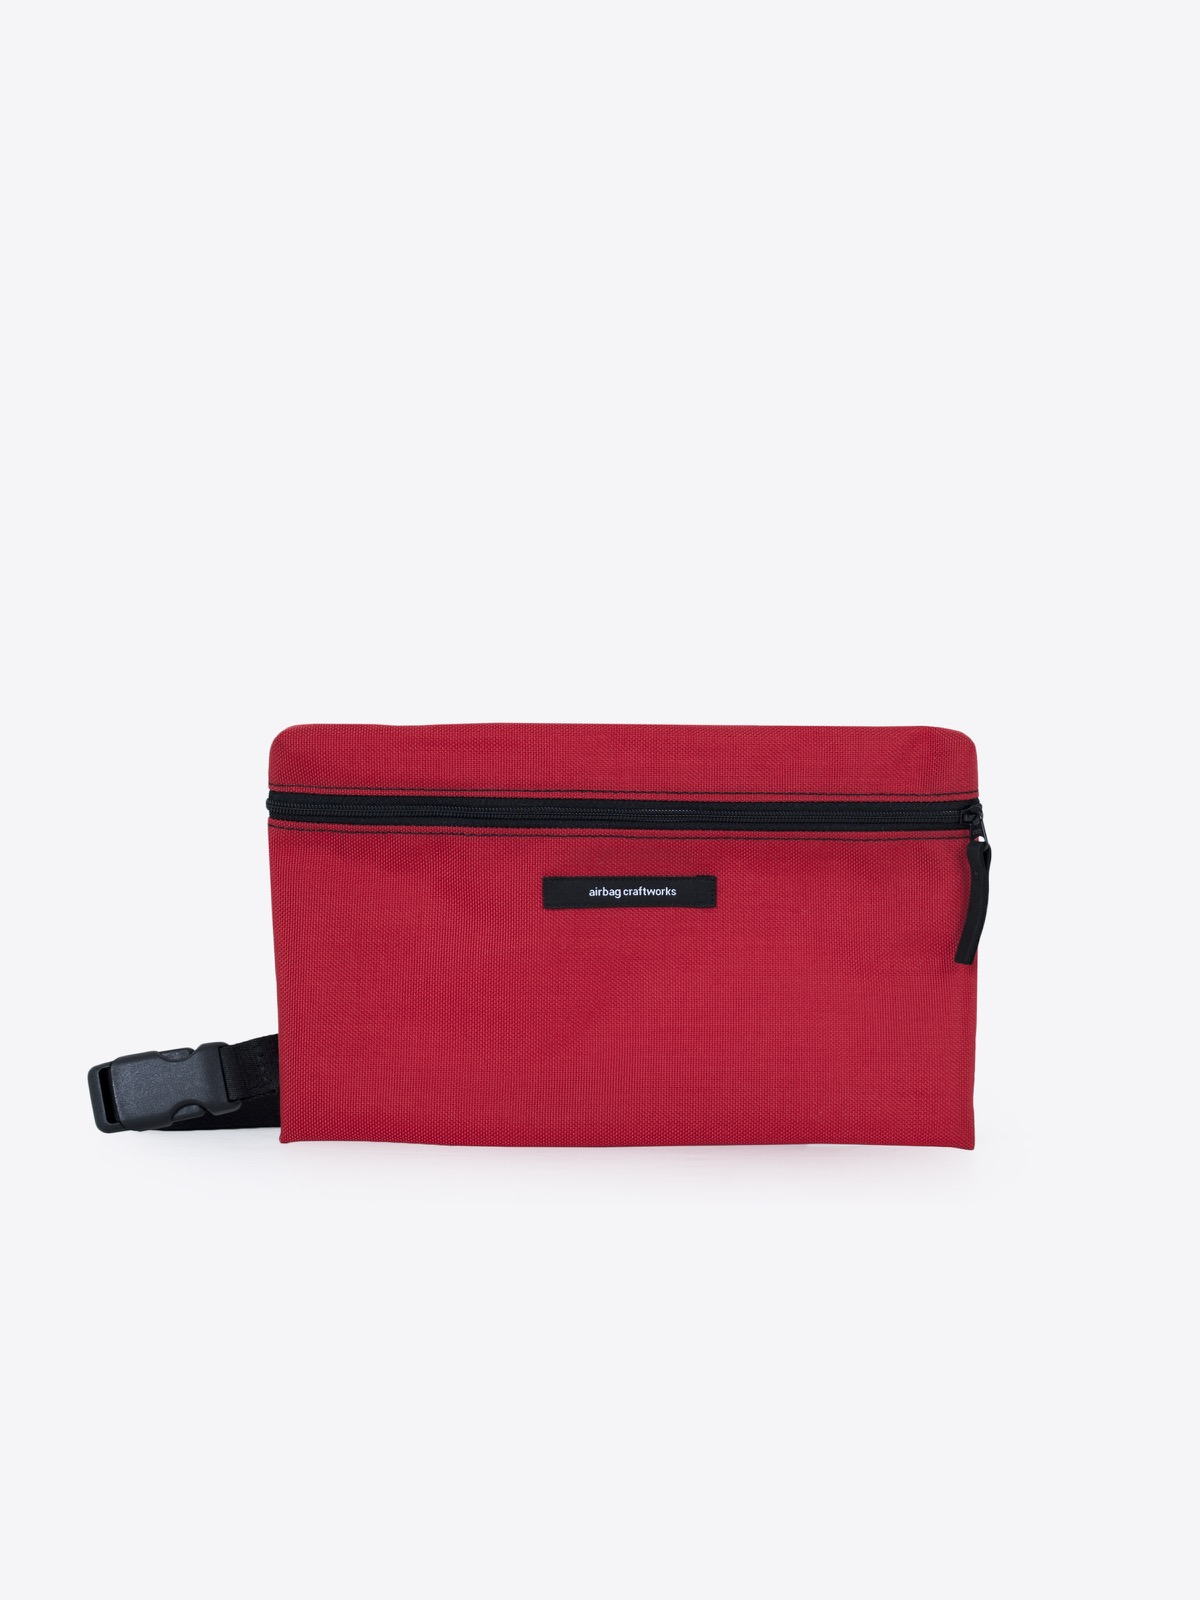 airbag craftworks red